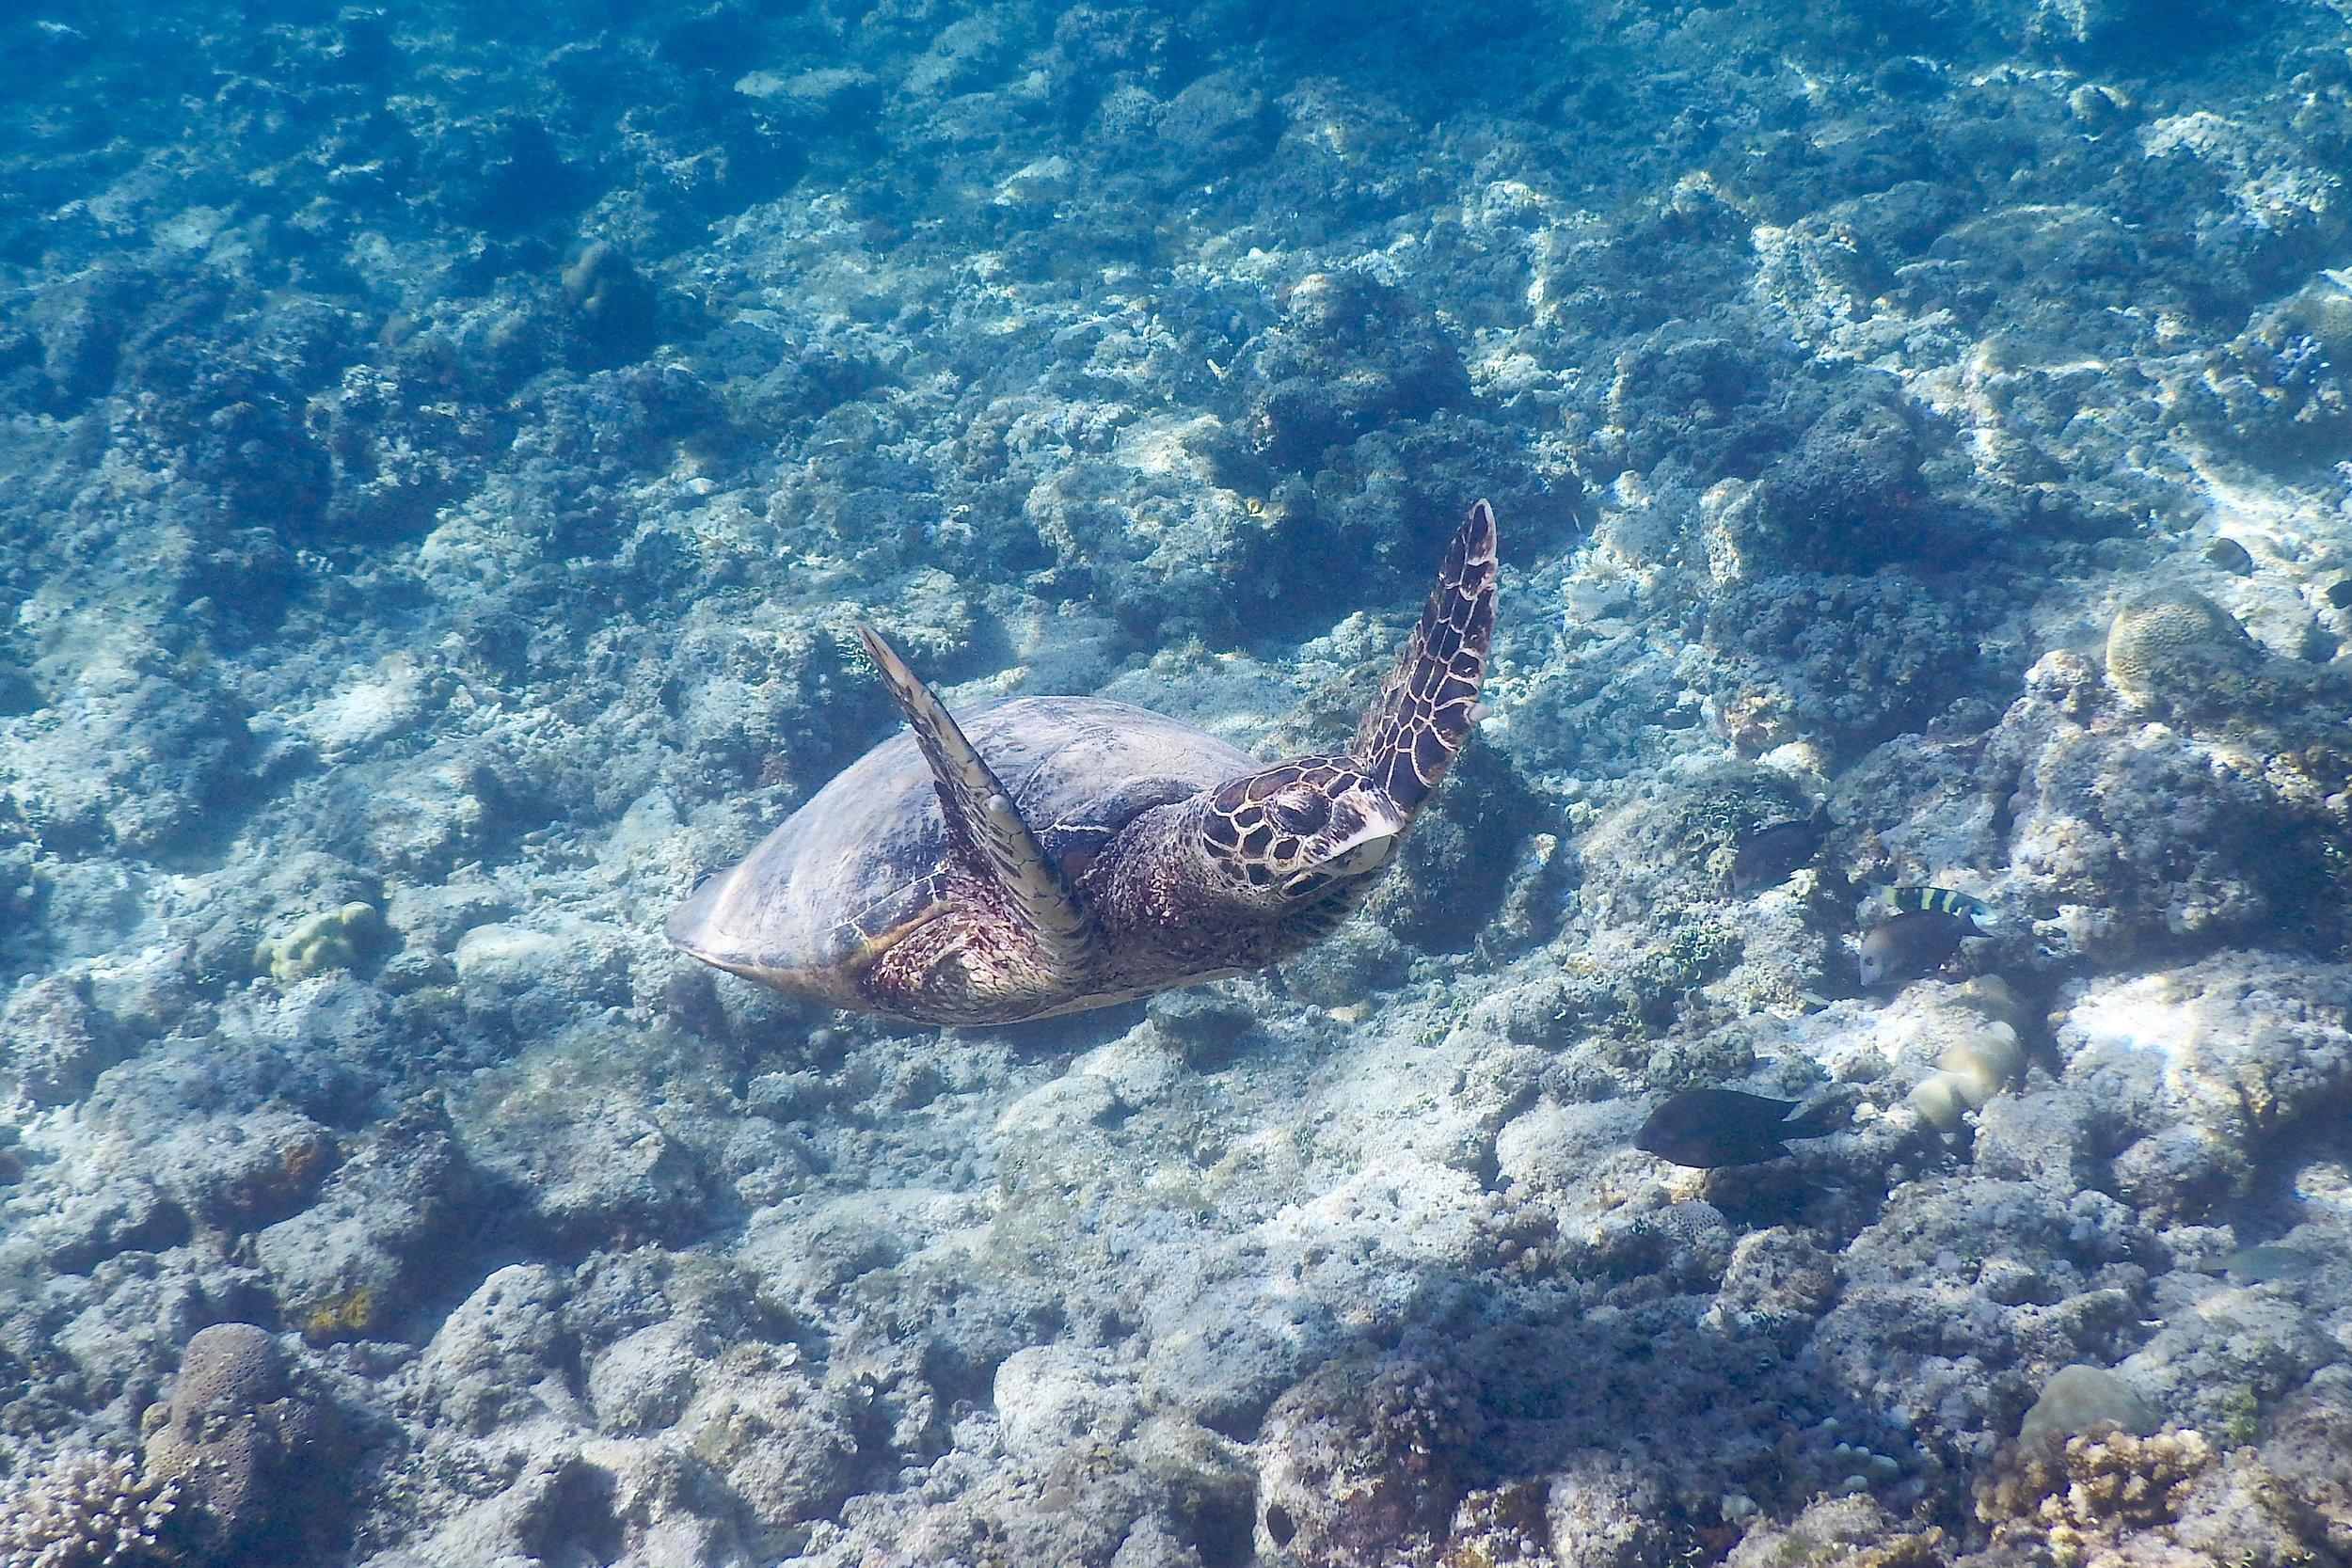 Green sea turtle, Gili Air, Lombok, Indonesia